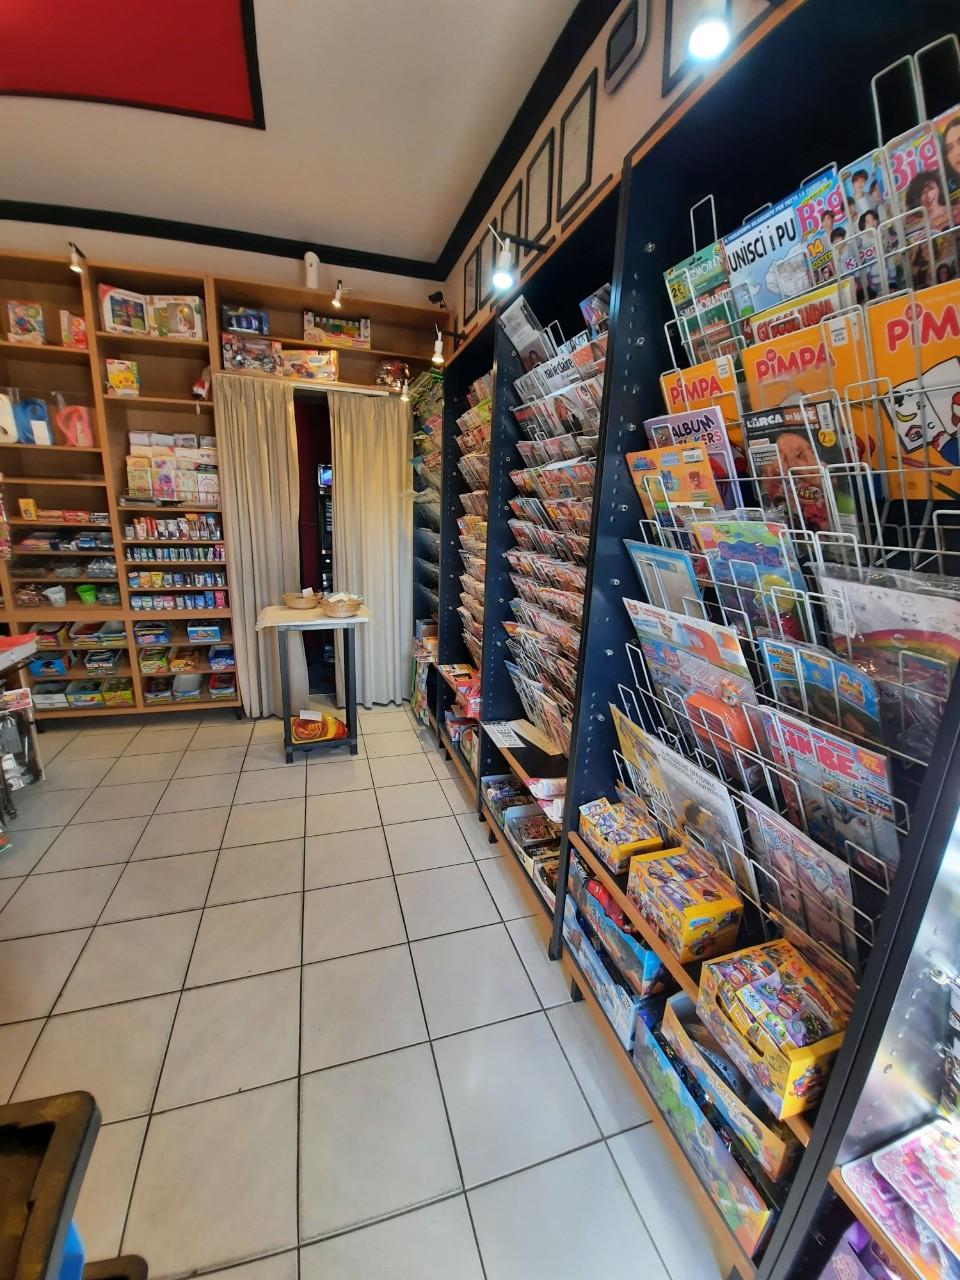 Edicola in vendita Santarcangelo di romagna